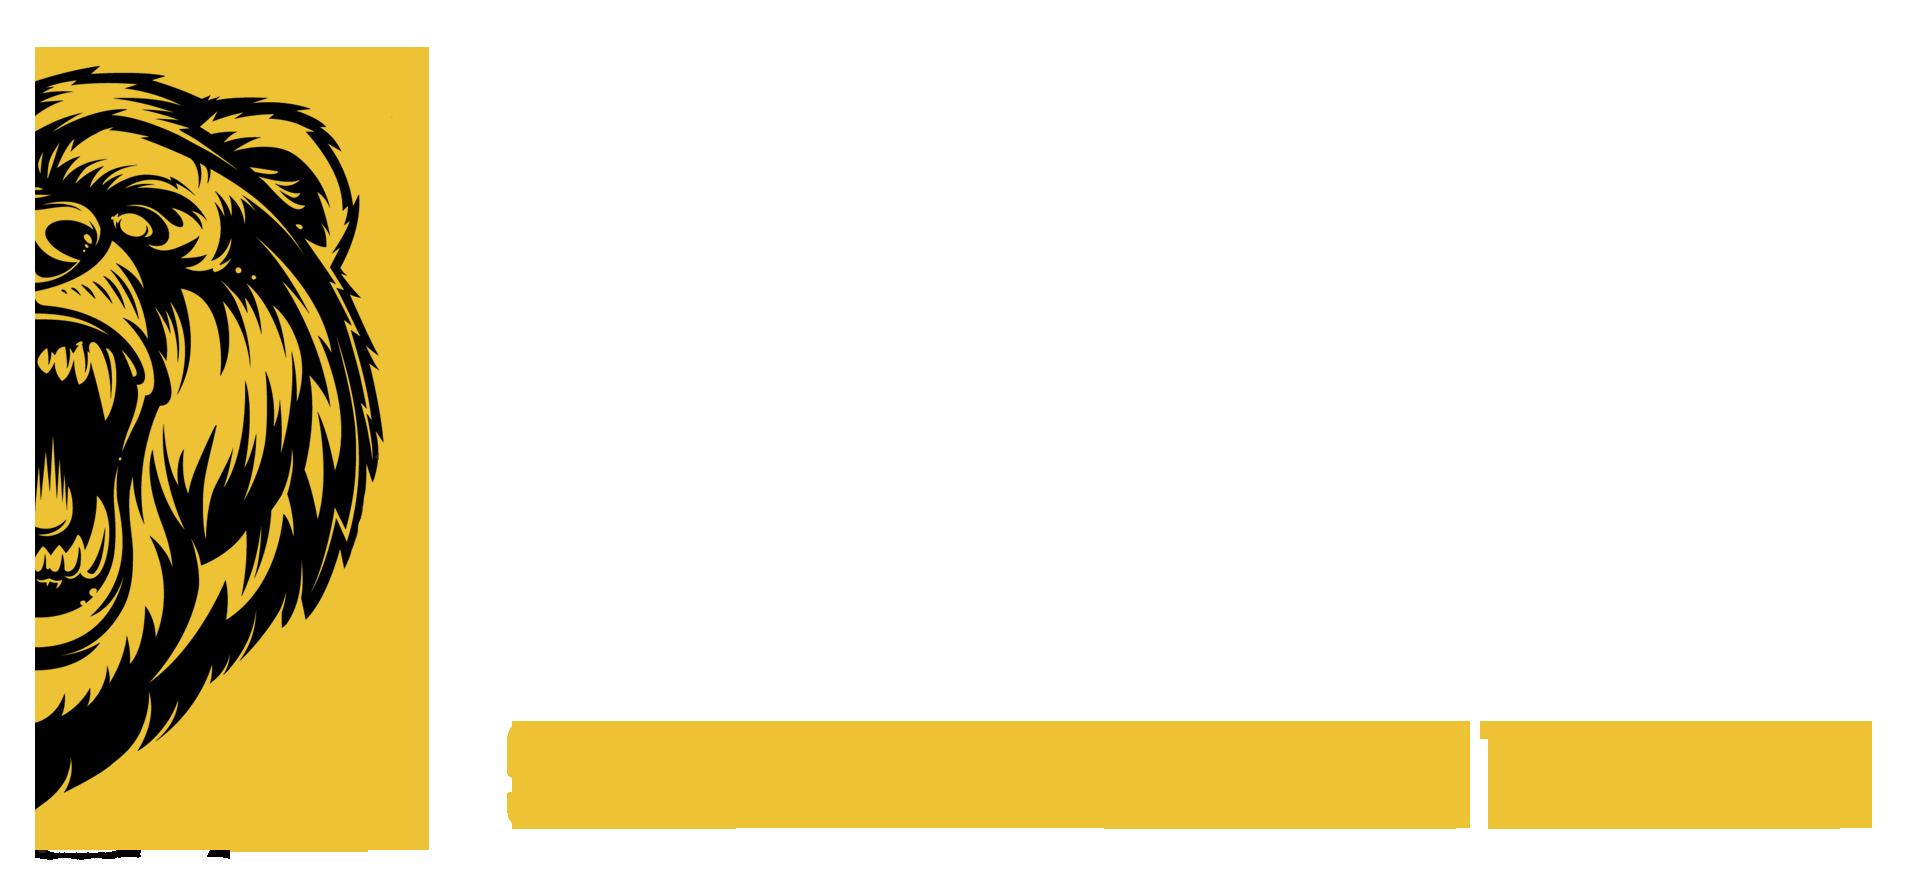 DIE FBSC NEWSLETTER